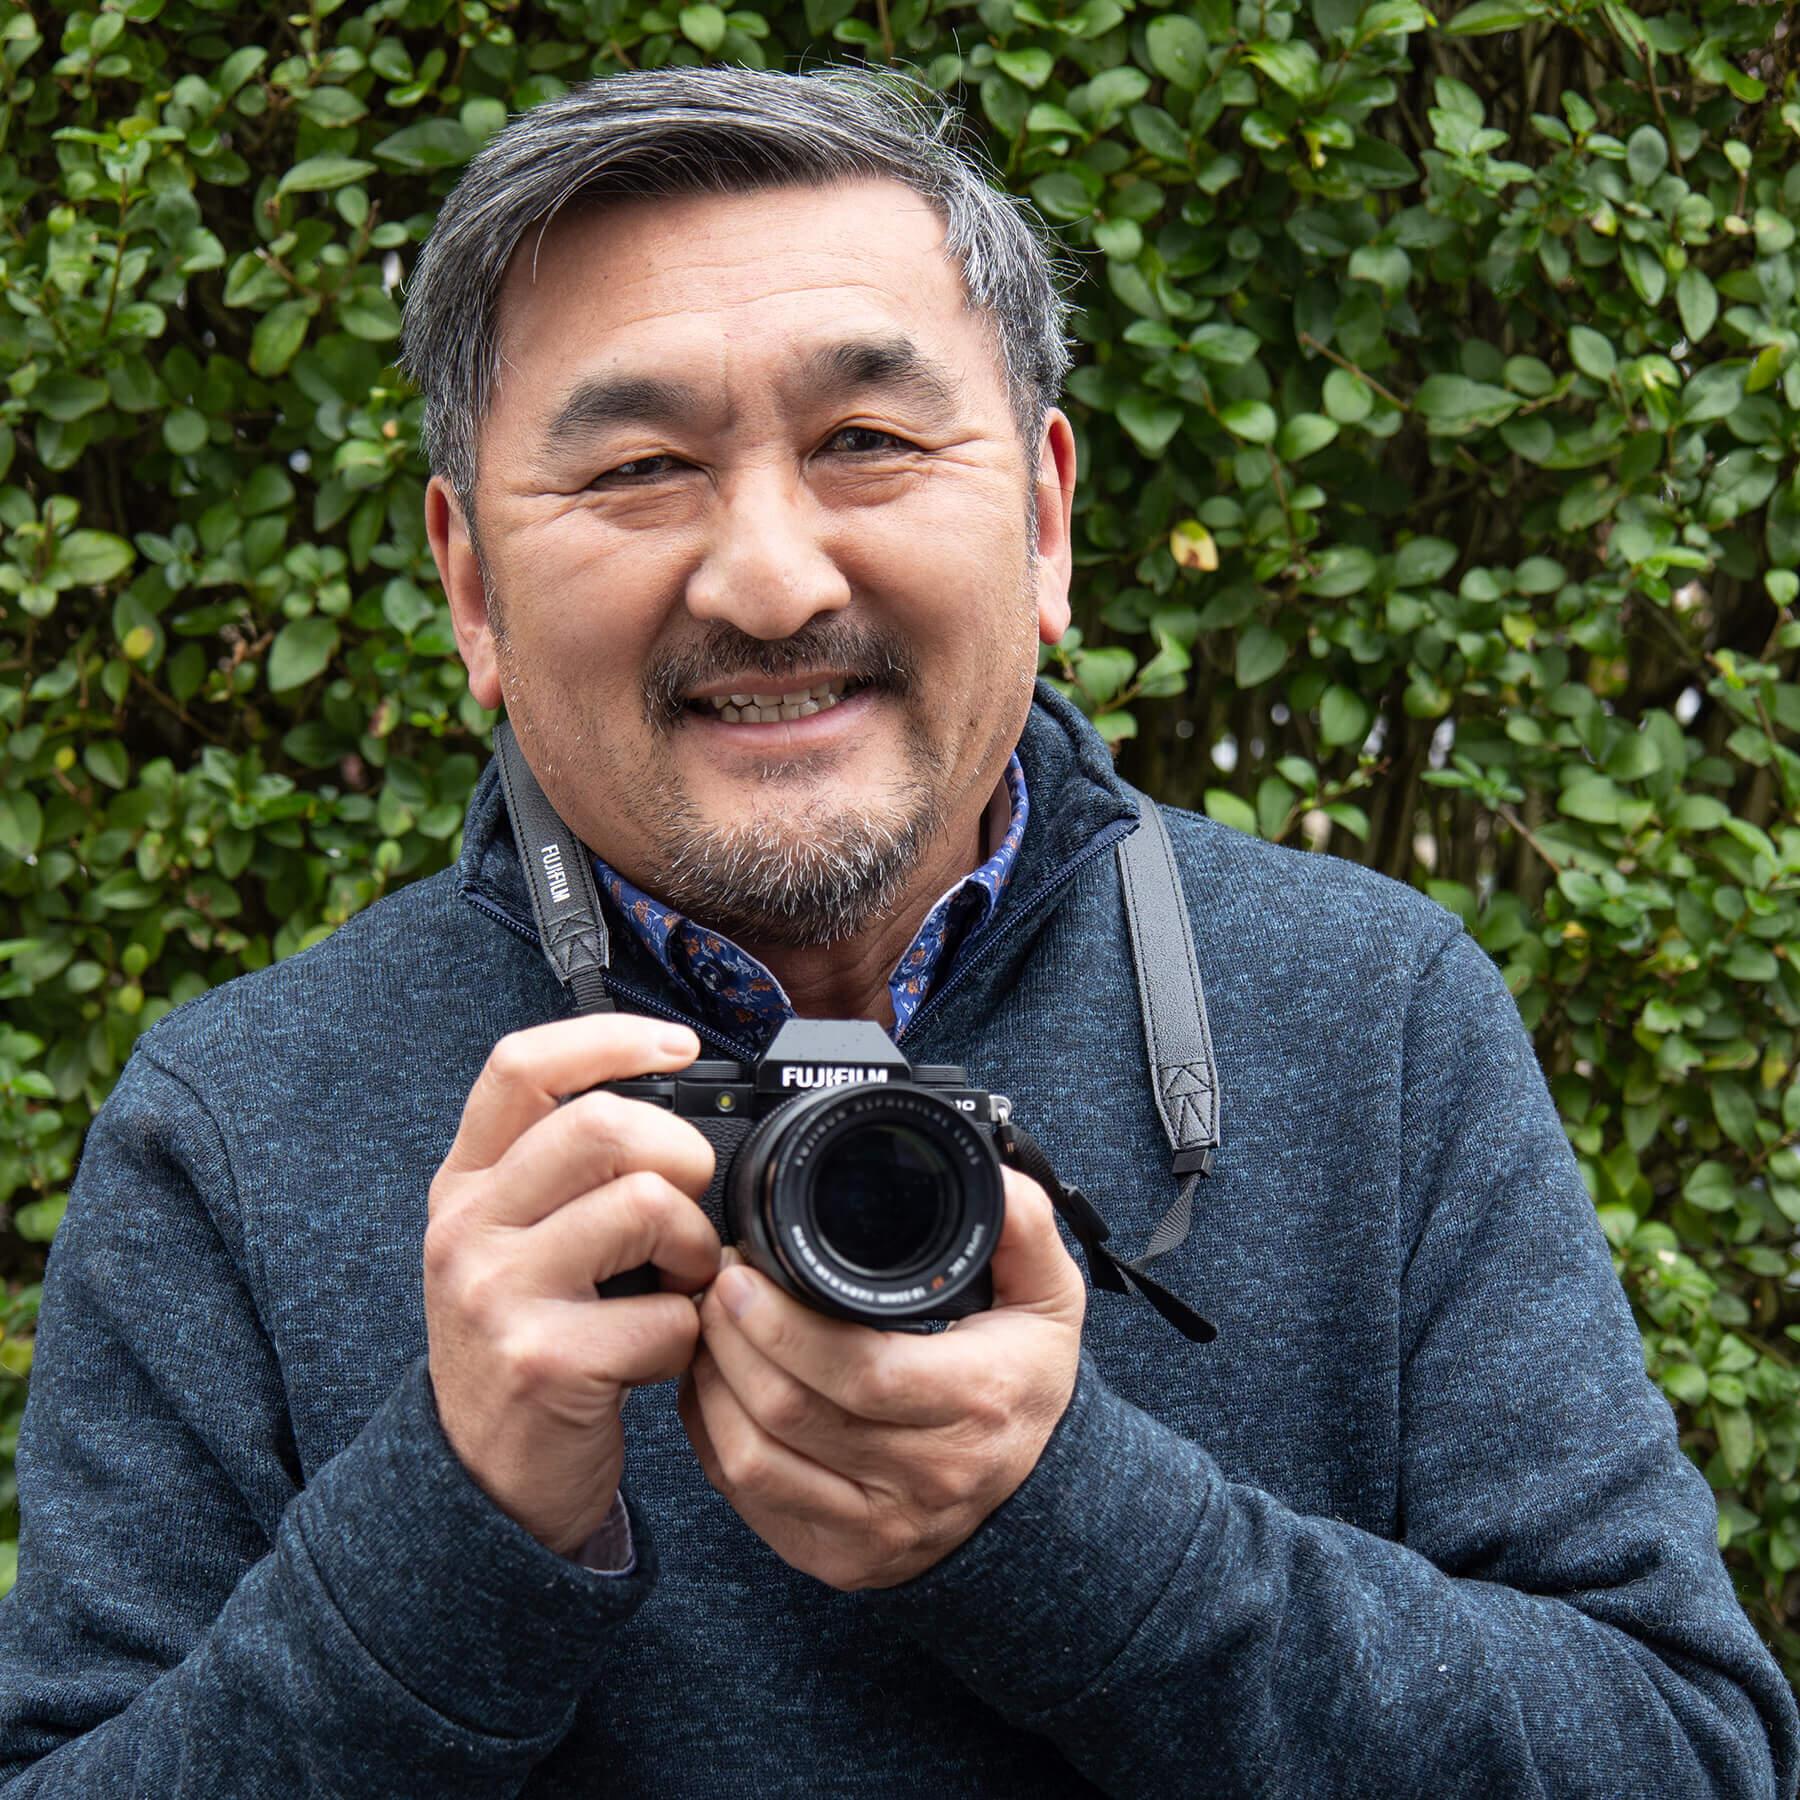 Fujifilm X-S10 hands-on